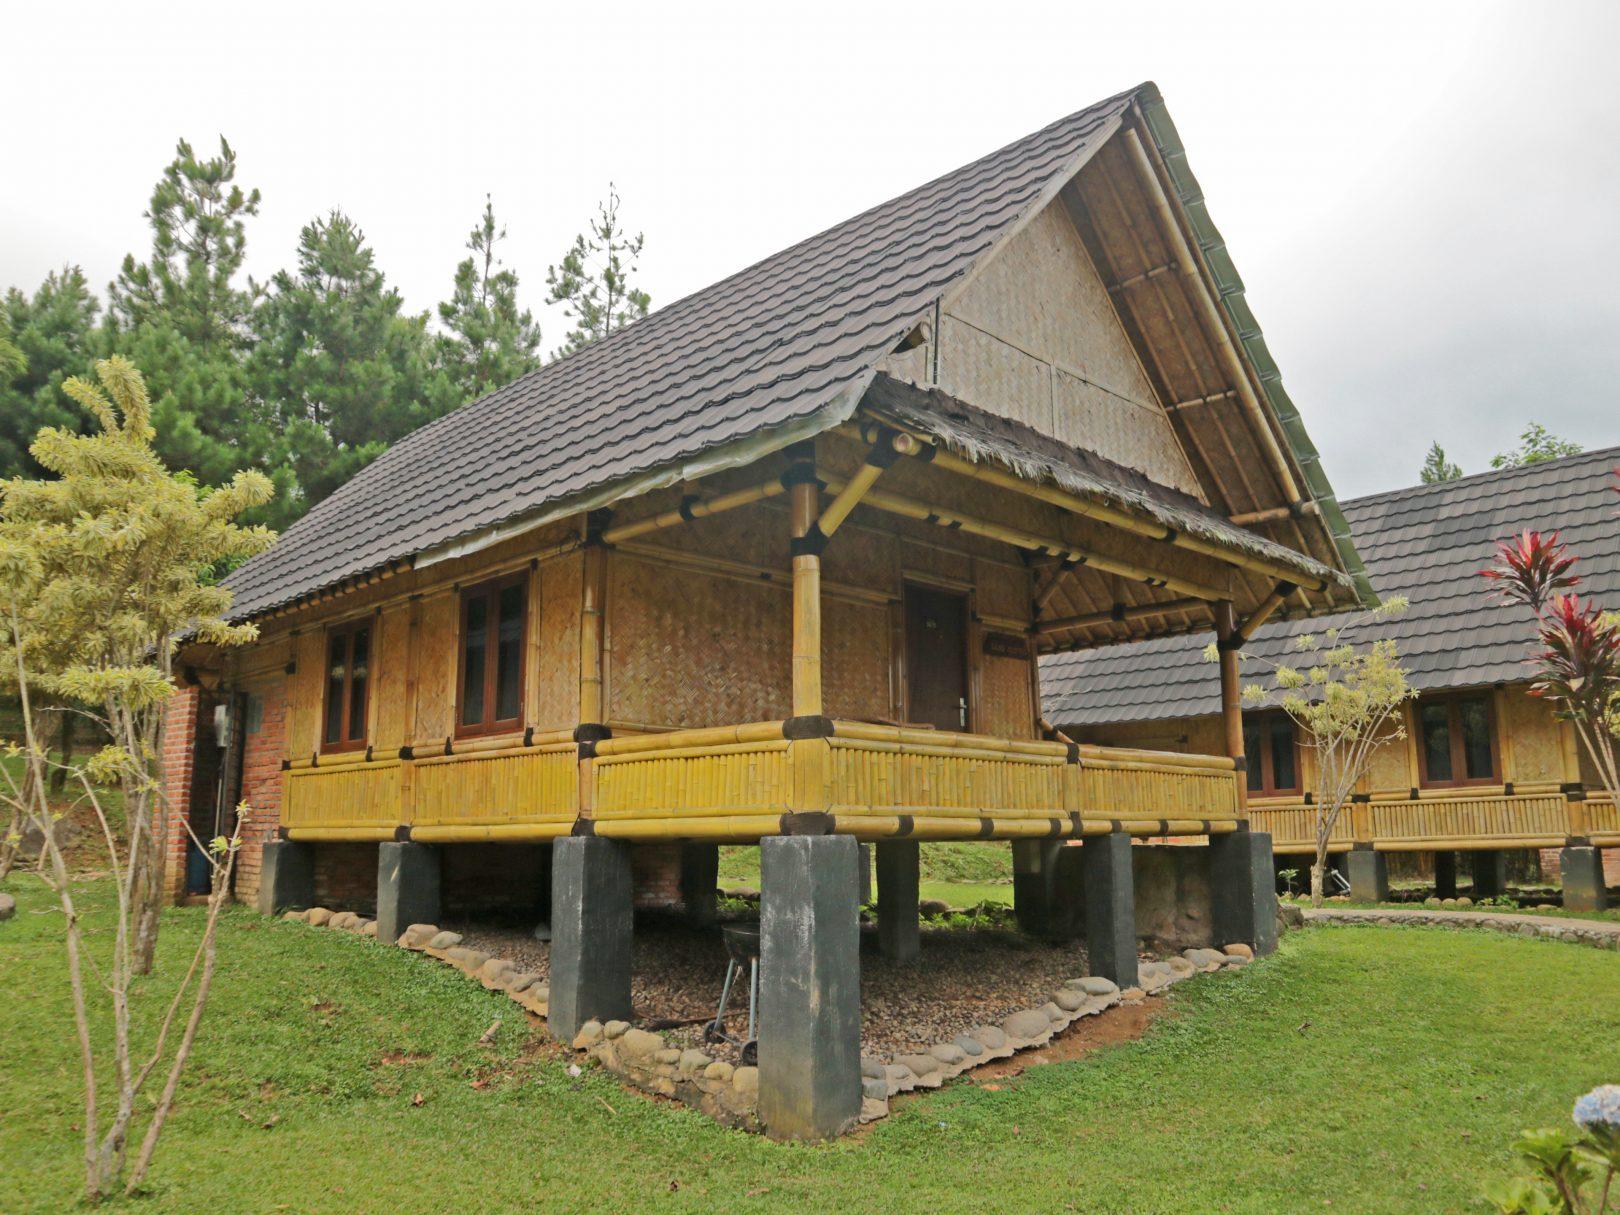 Saung Jolopong